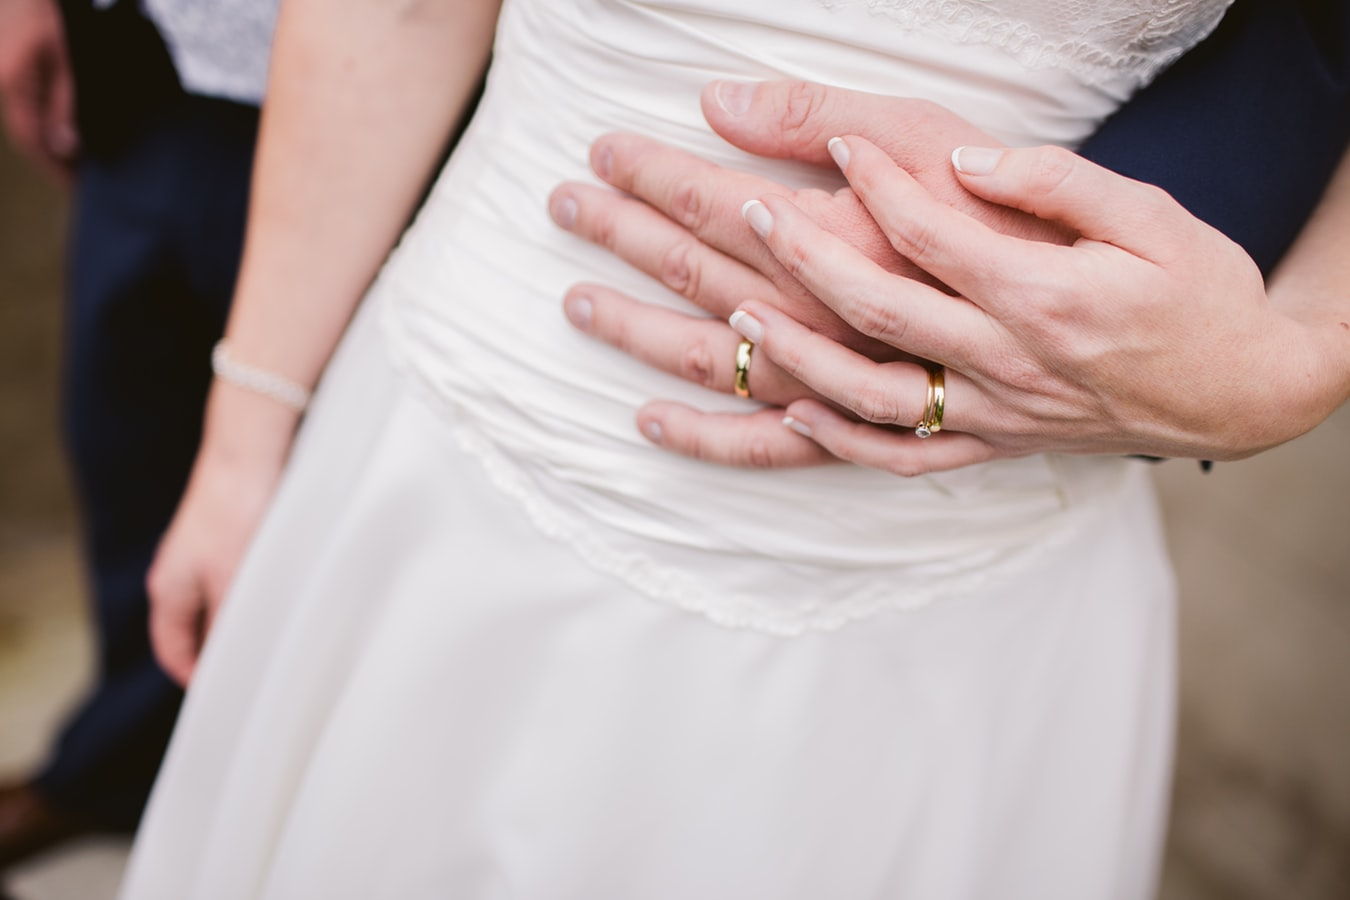 Couple wearing wedding ring holding hand